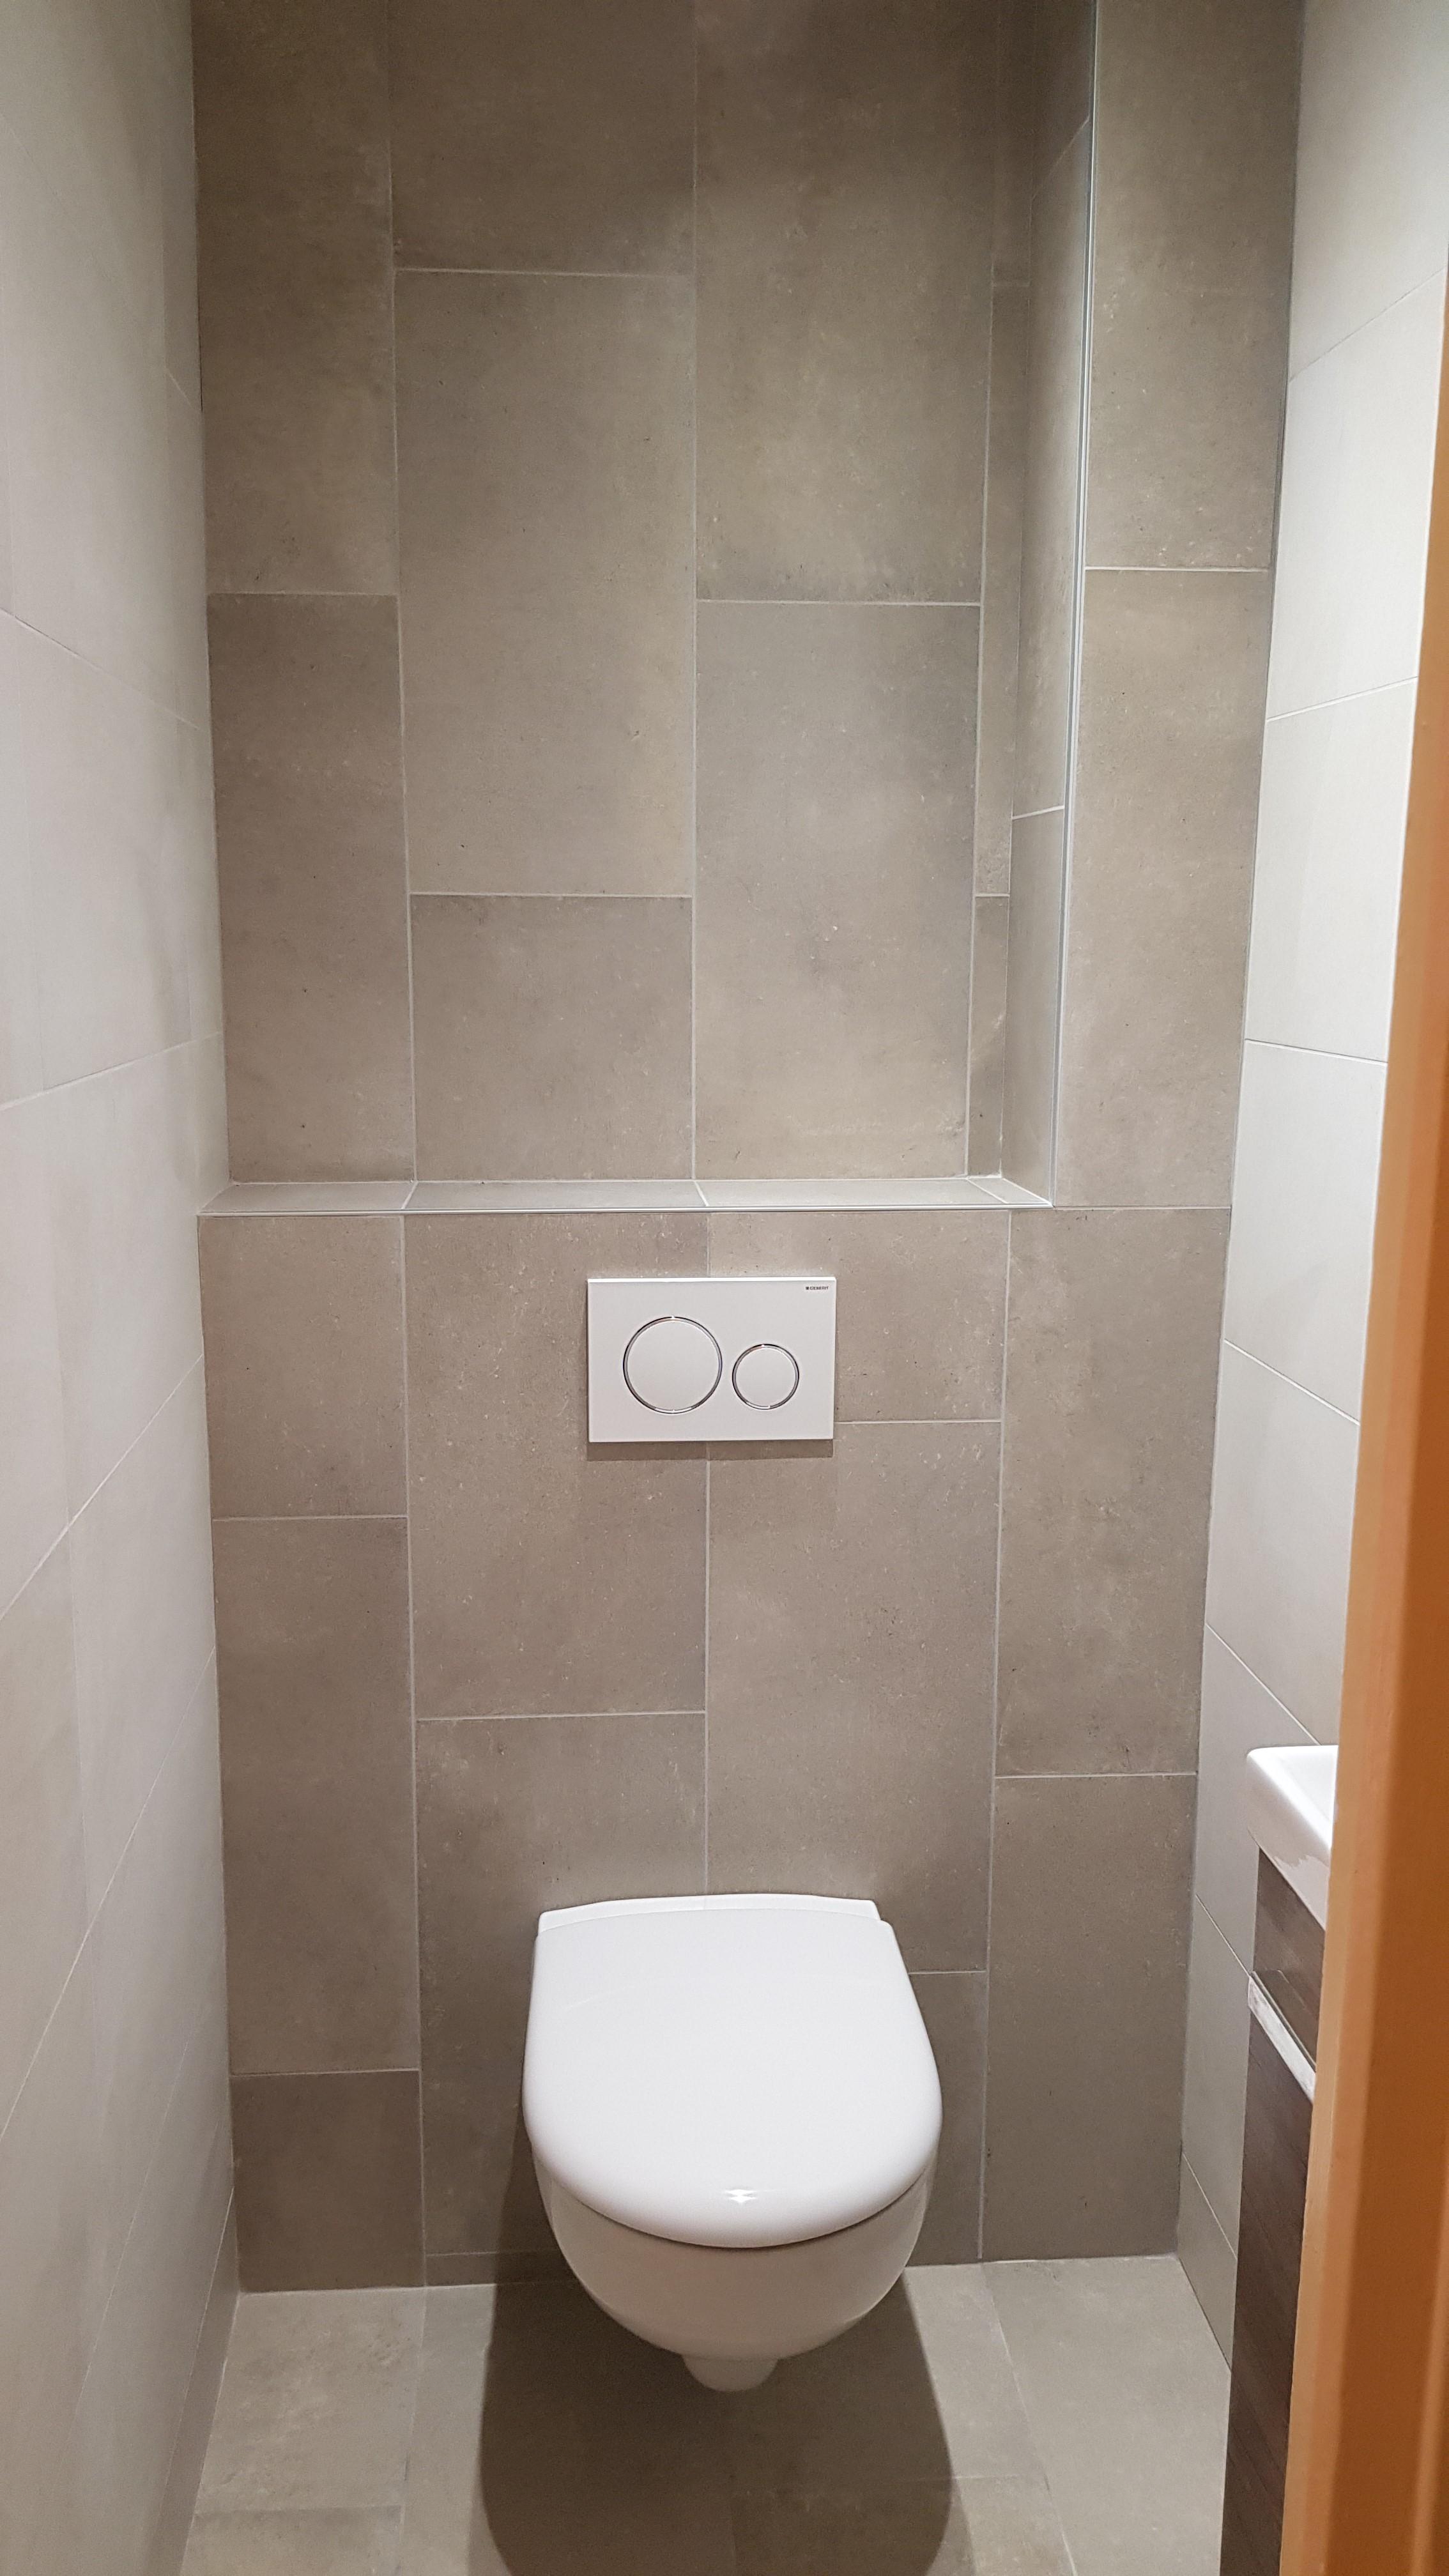 Toilette suspendue